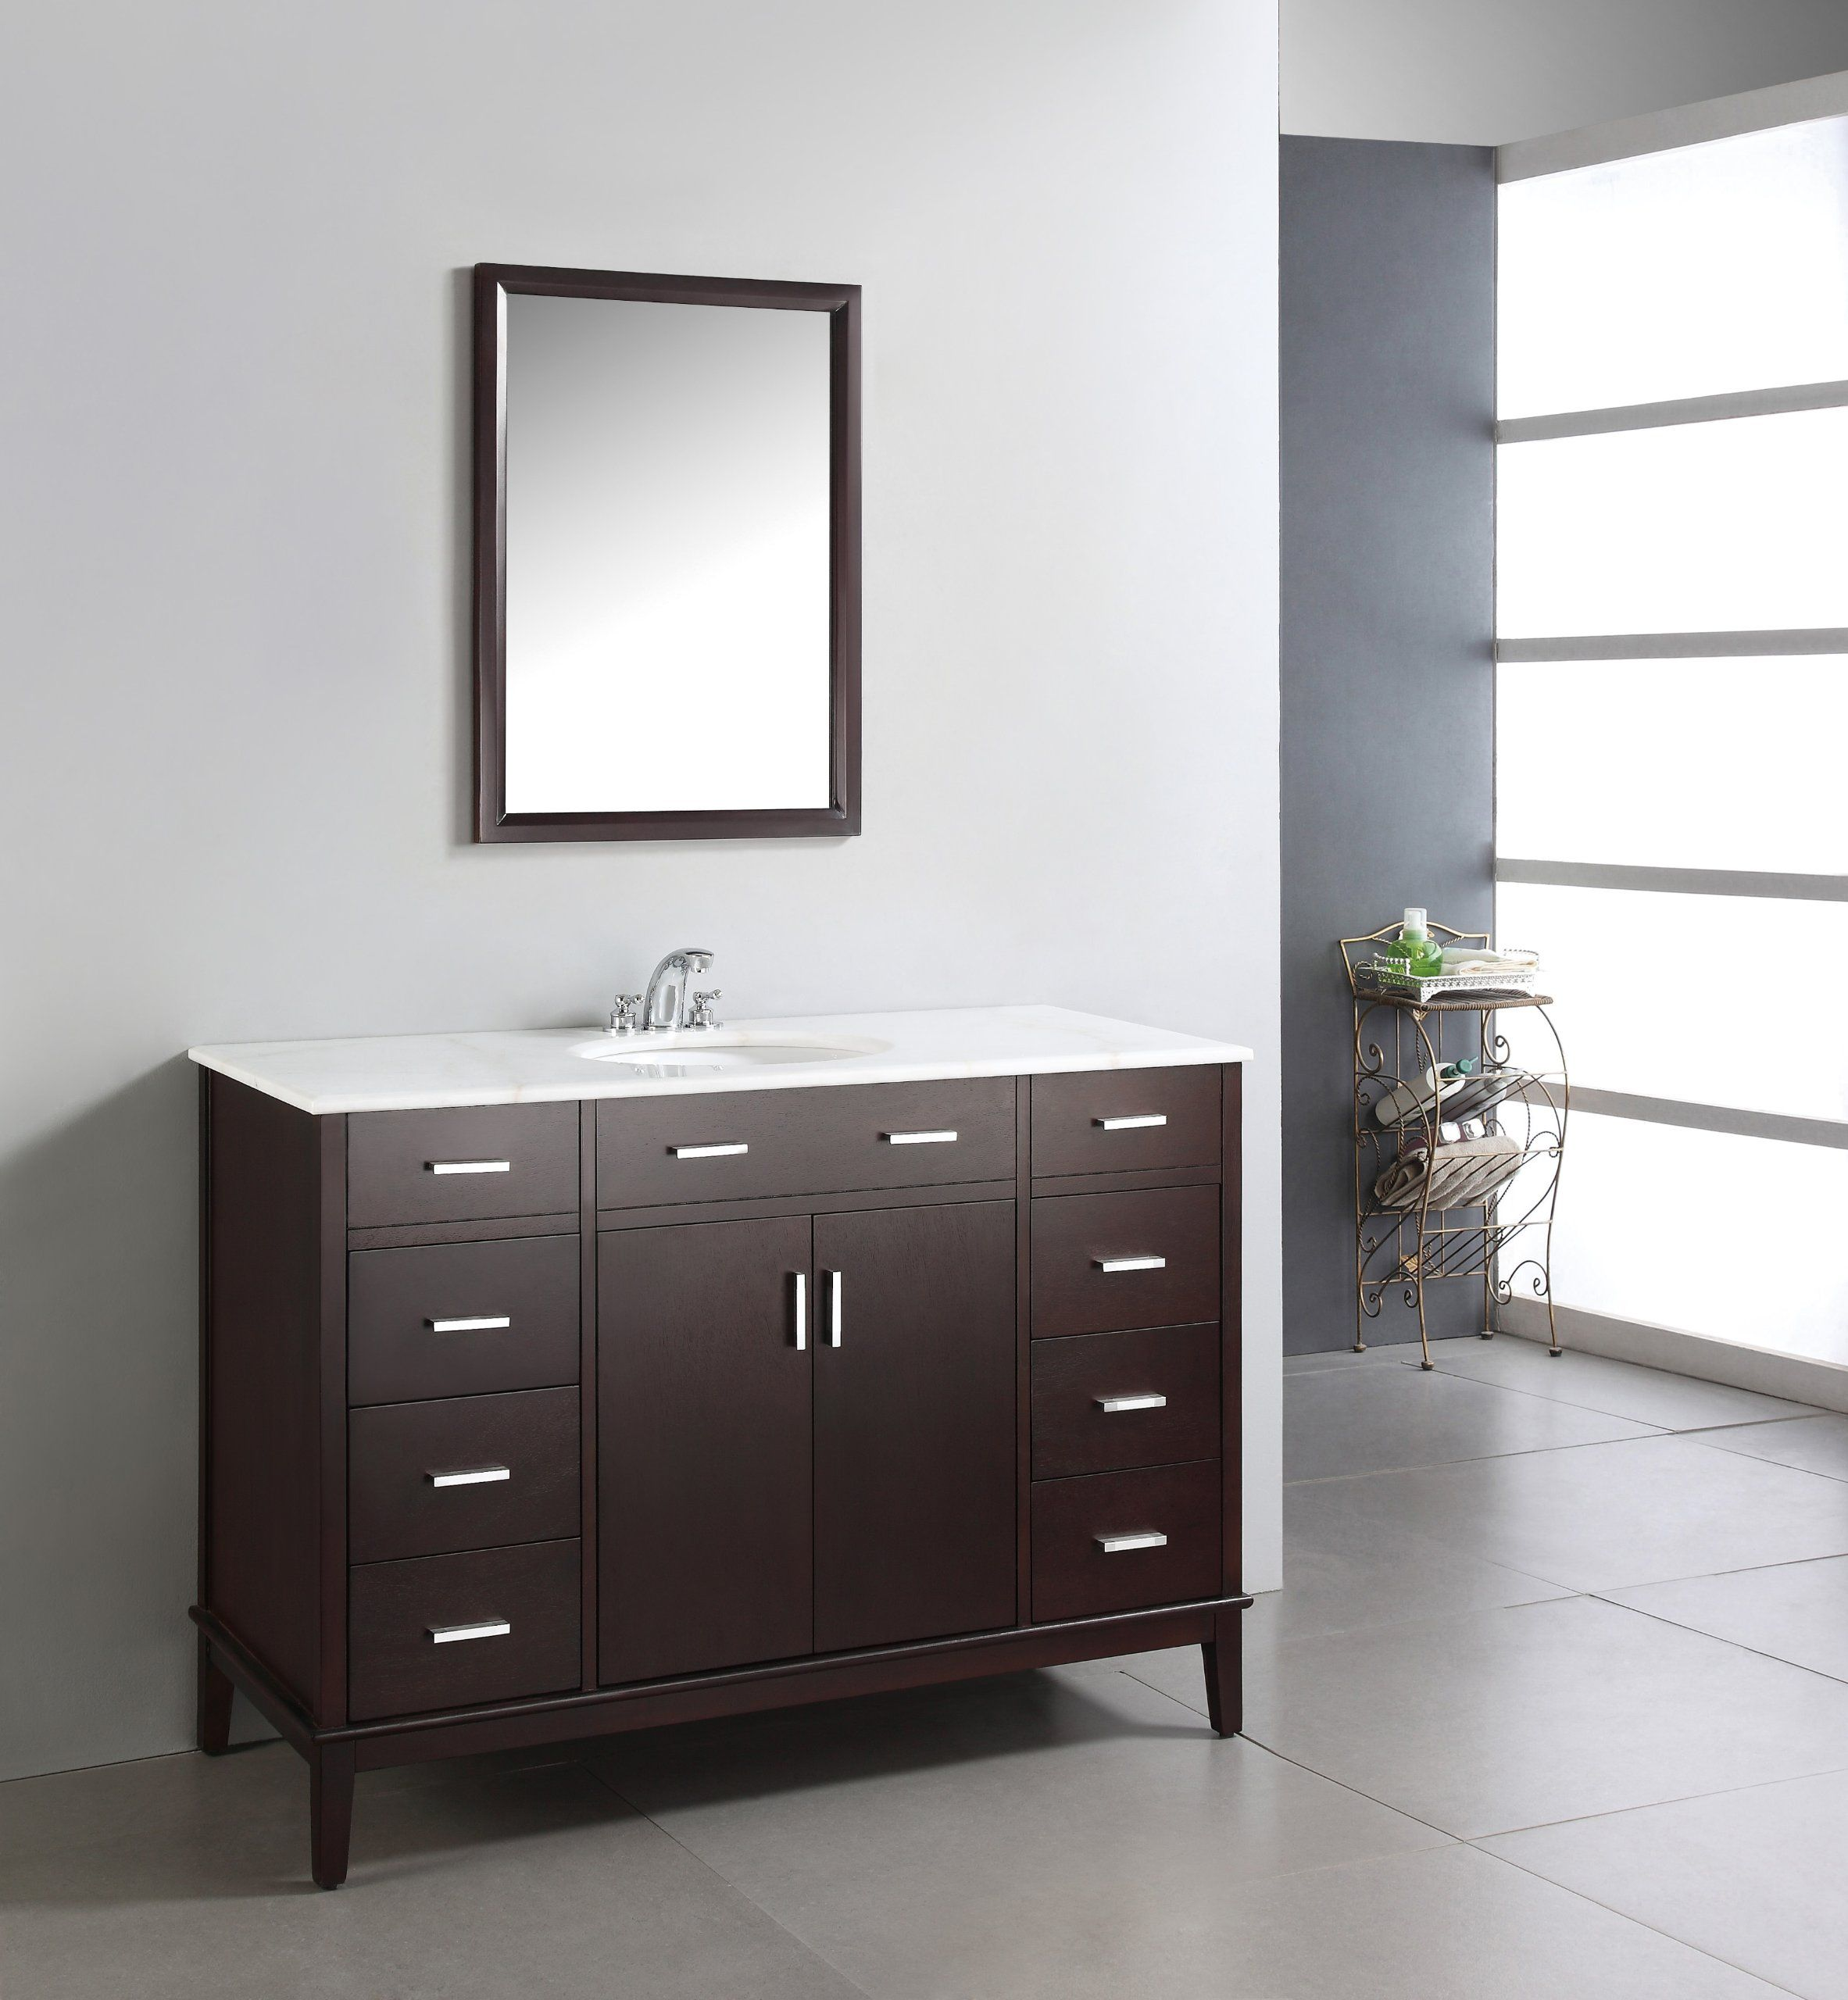 Amazoncom Simpli Home Nl Clt090201 48 2A Urban Loft Collection